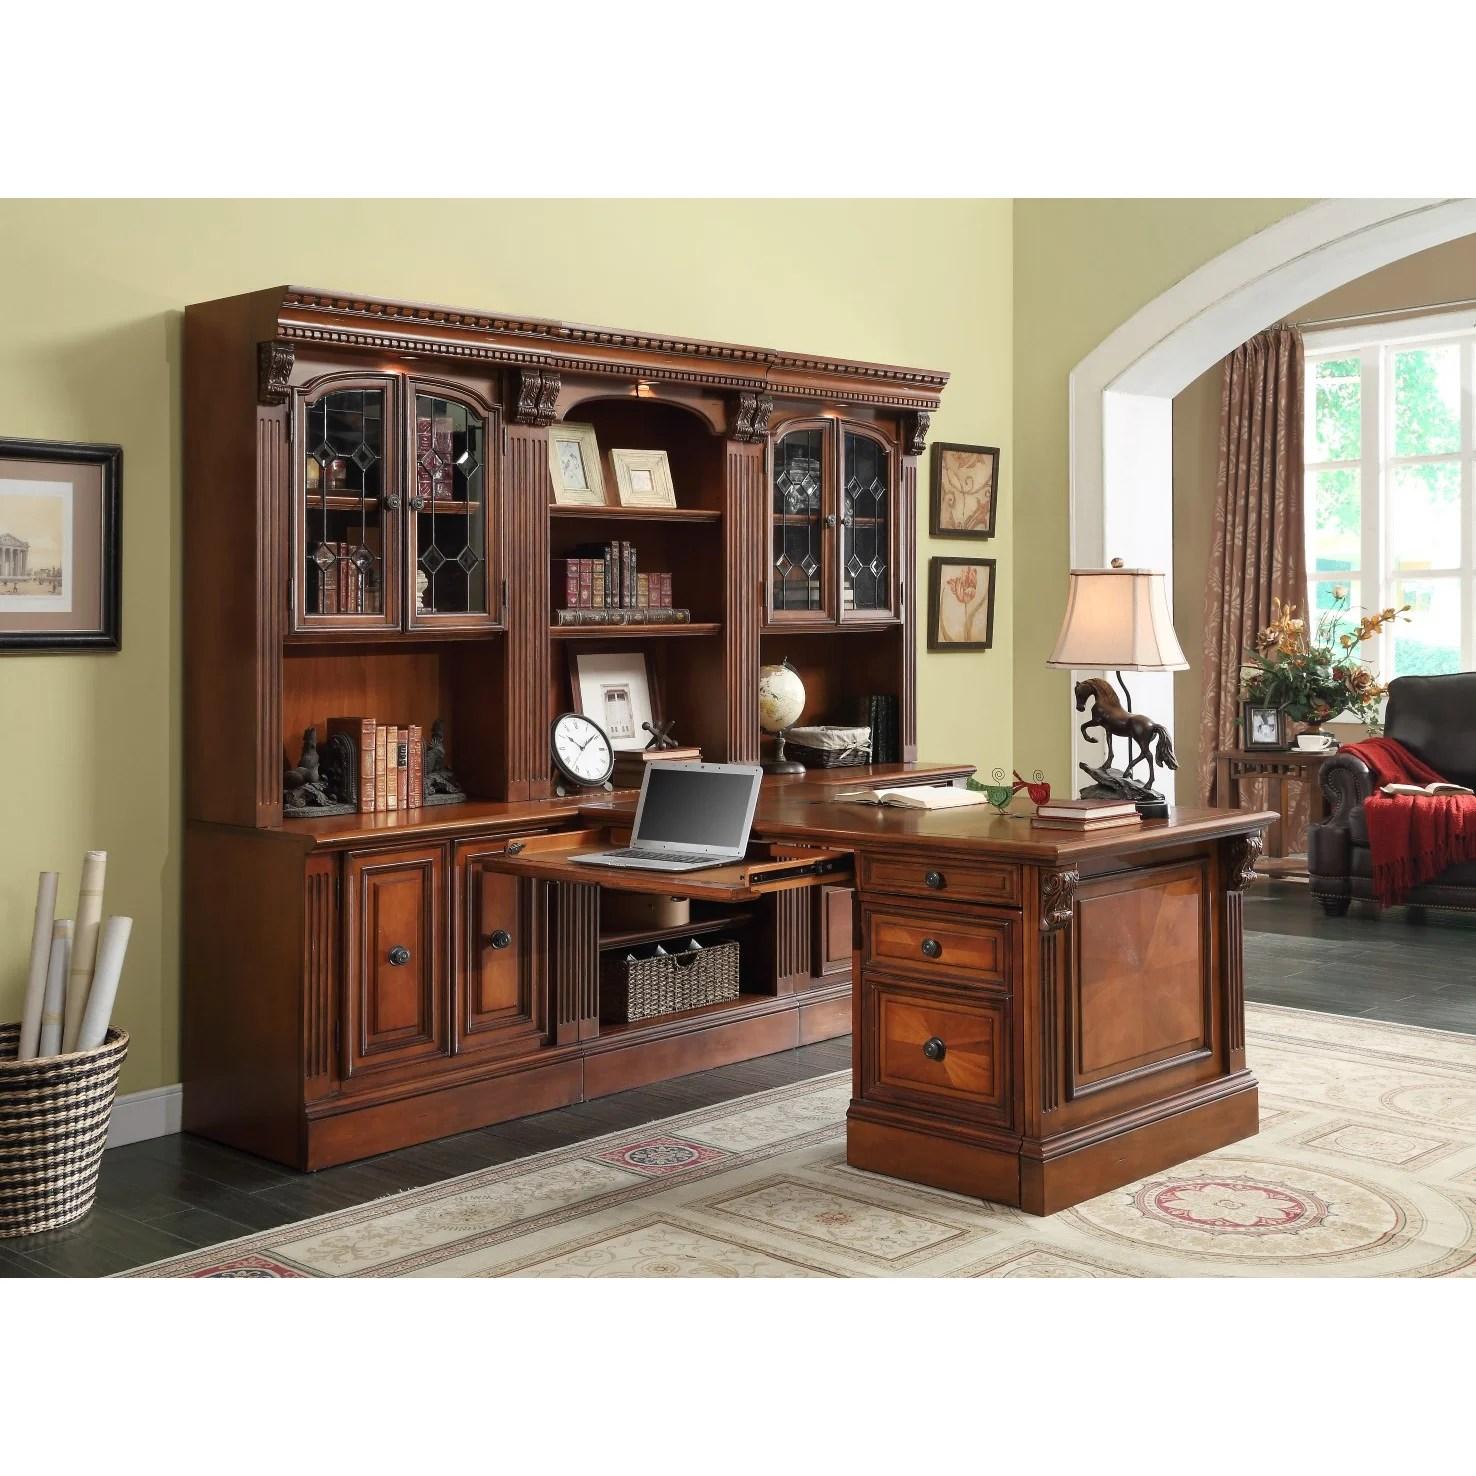 Elegant ... Reviews Huntington House Furniture. Download